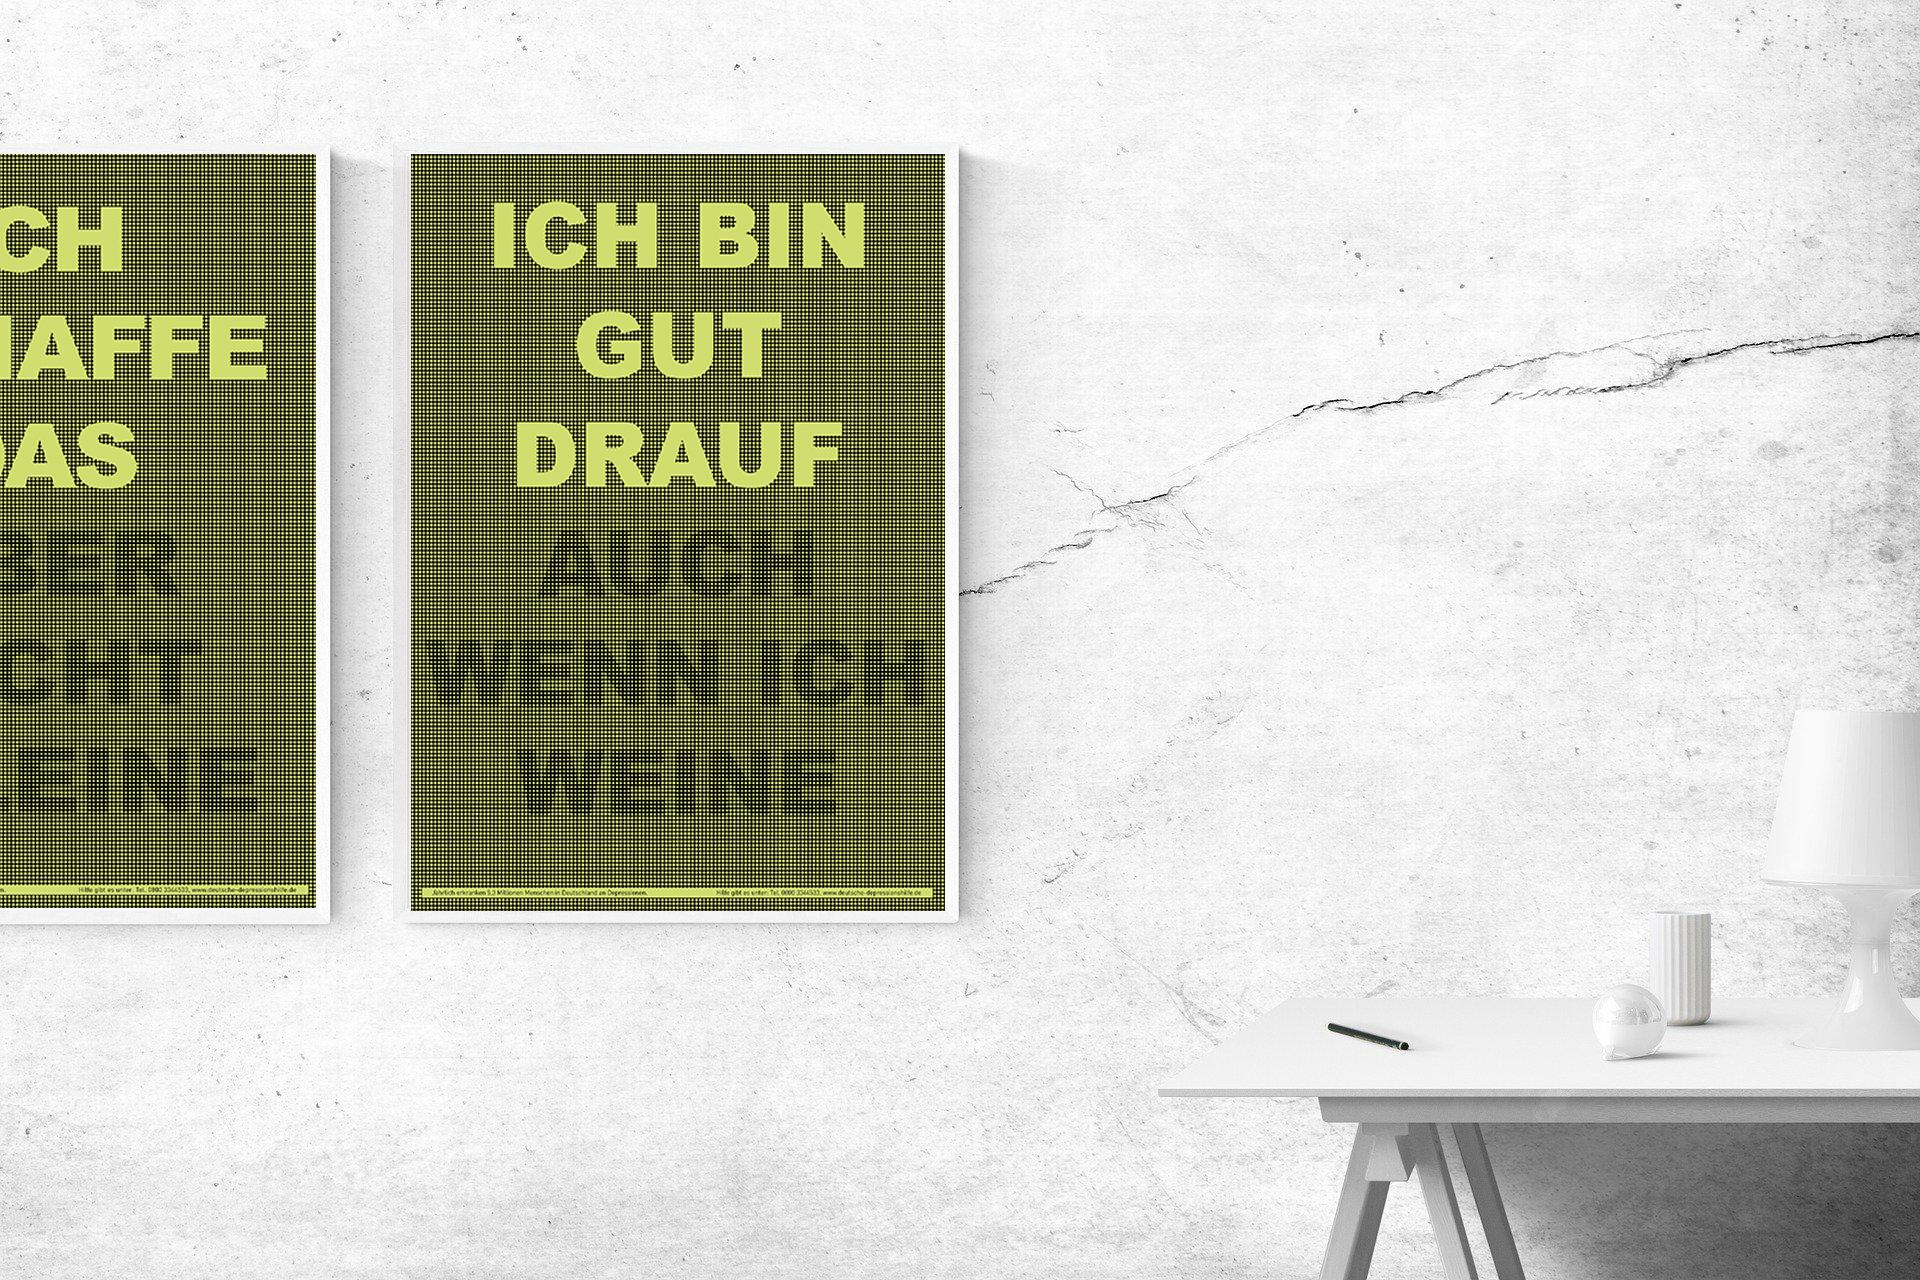 poster-mockup-2853843_1920_be